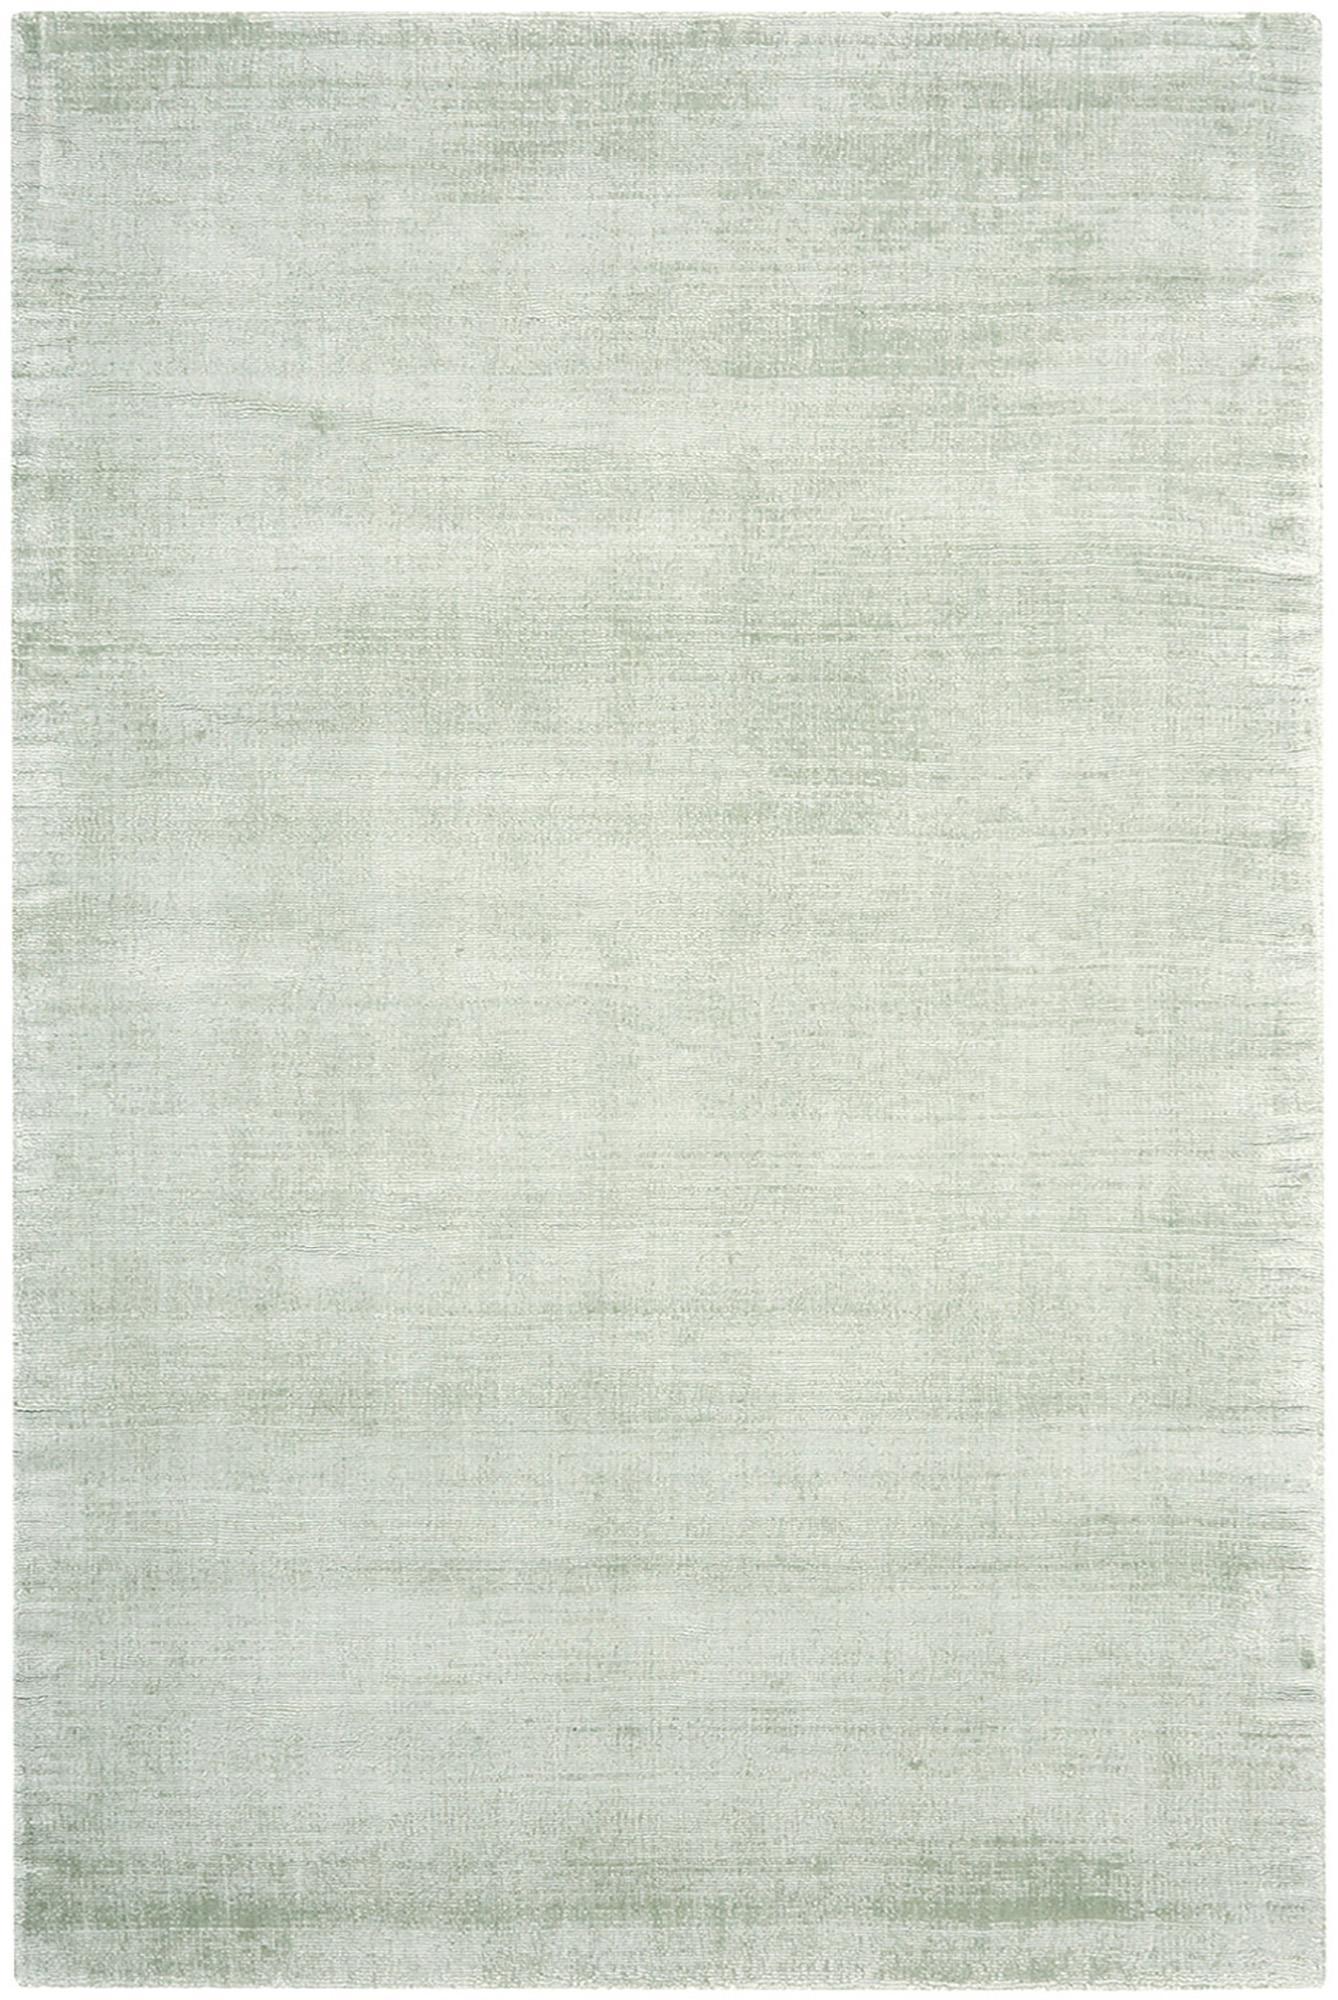 Alfombra artesanal de viscosa Jane, Parte superior: 100%viscosa, Reverso: 100%algodón, Verde claro, An 120 x L 180 cm (Tamaño S)